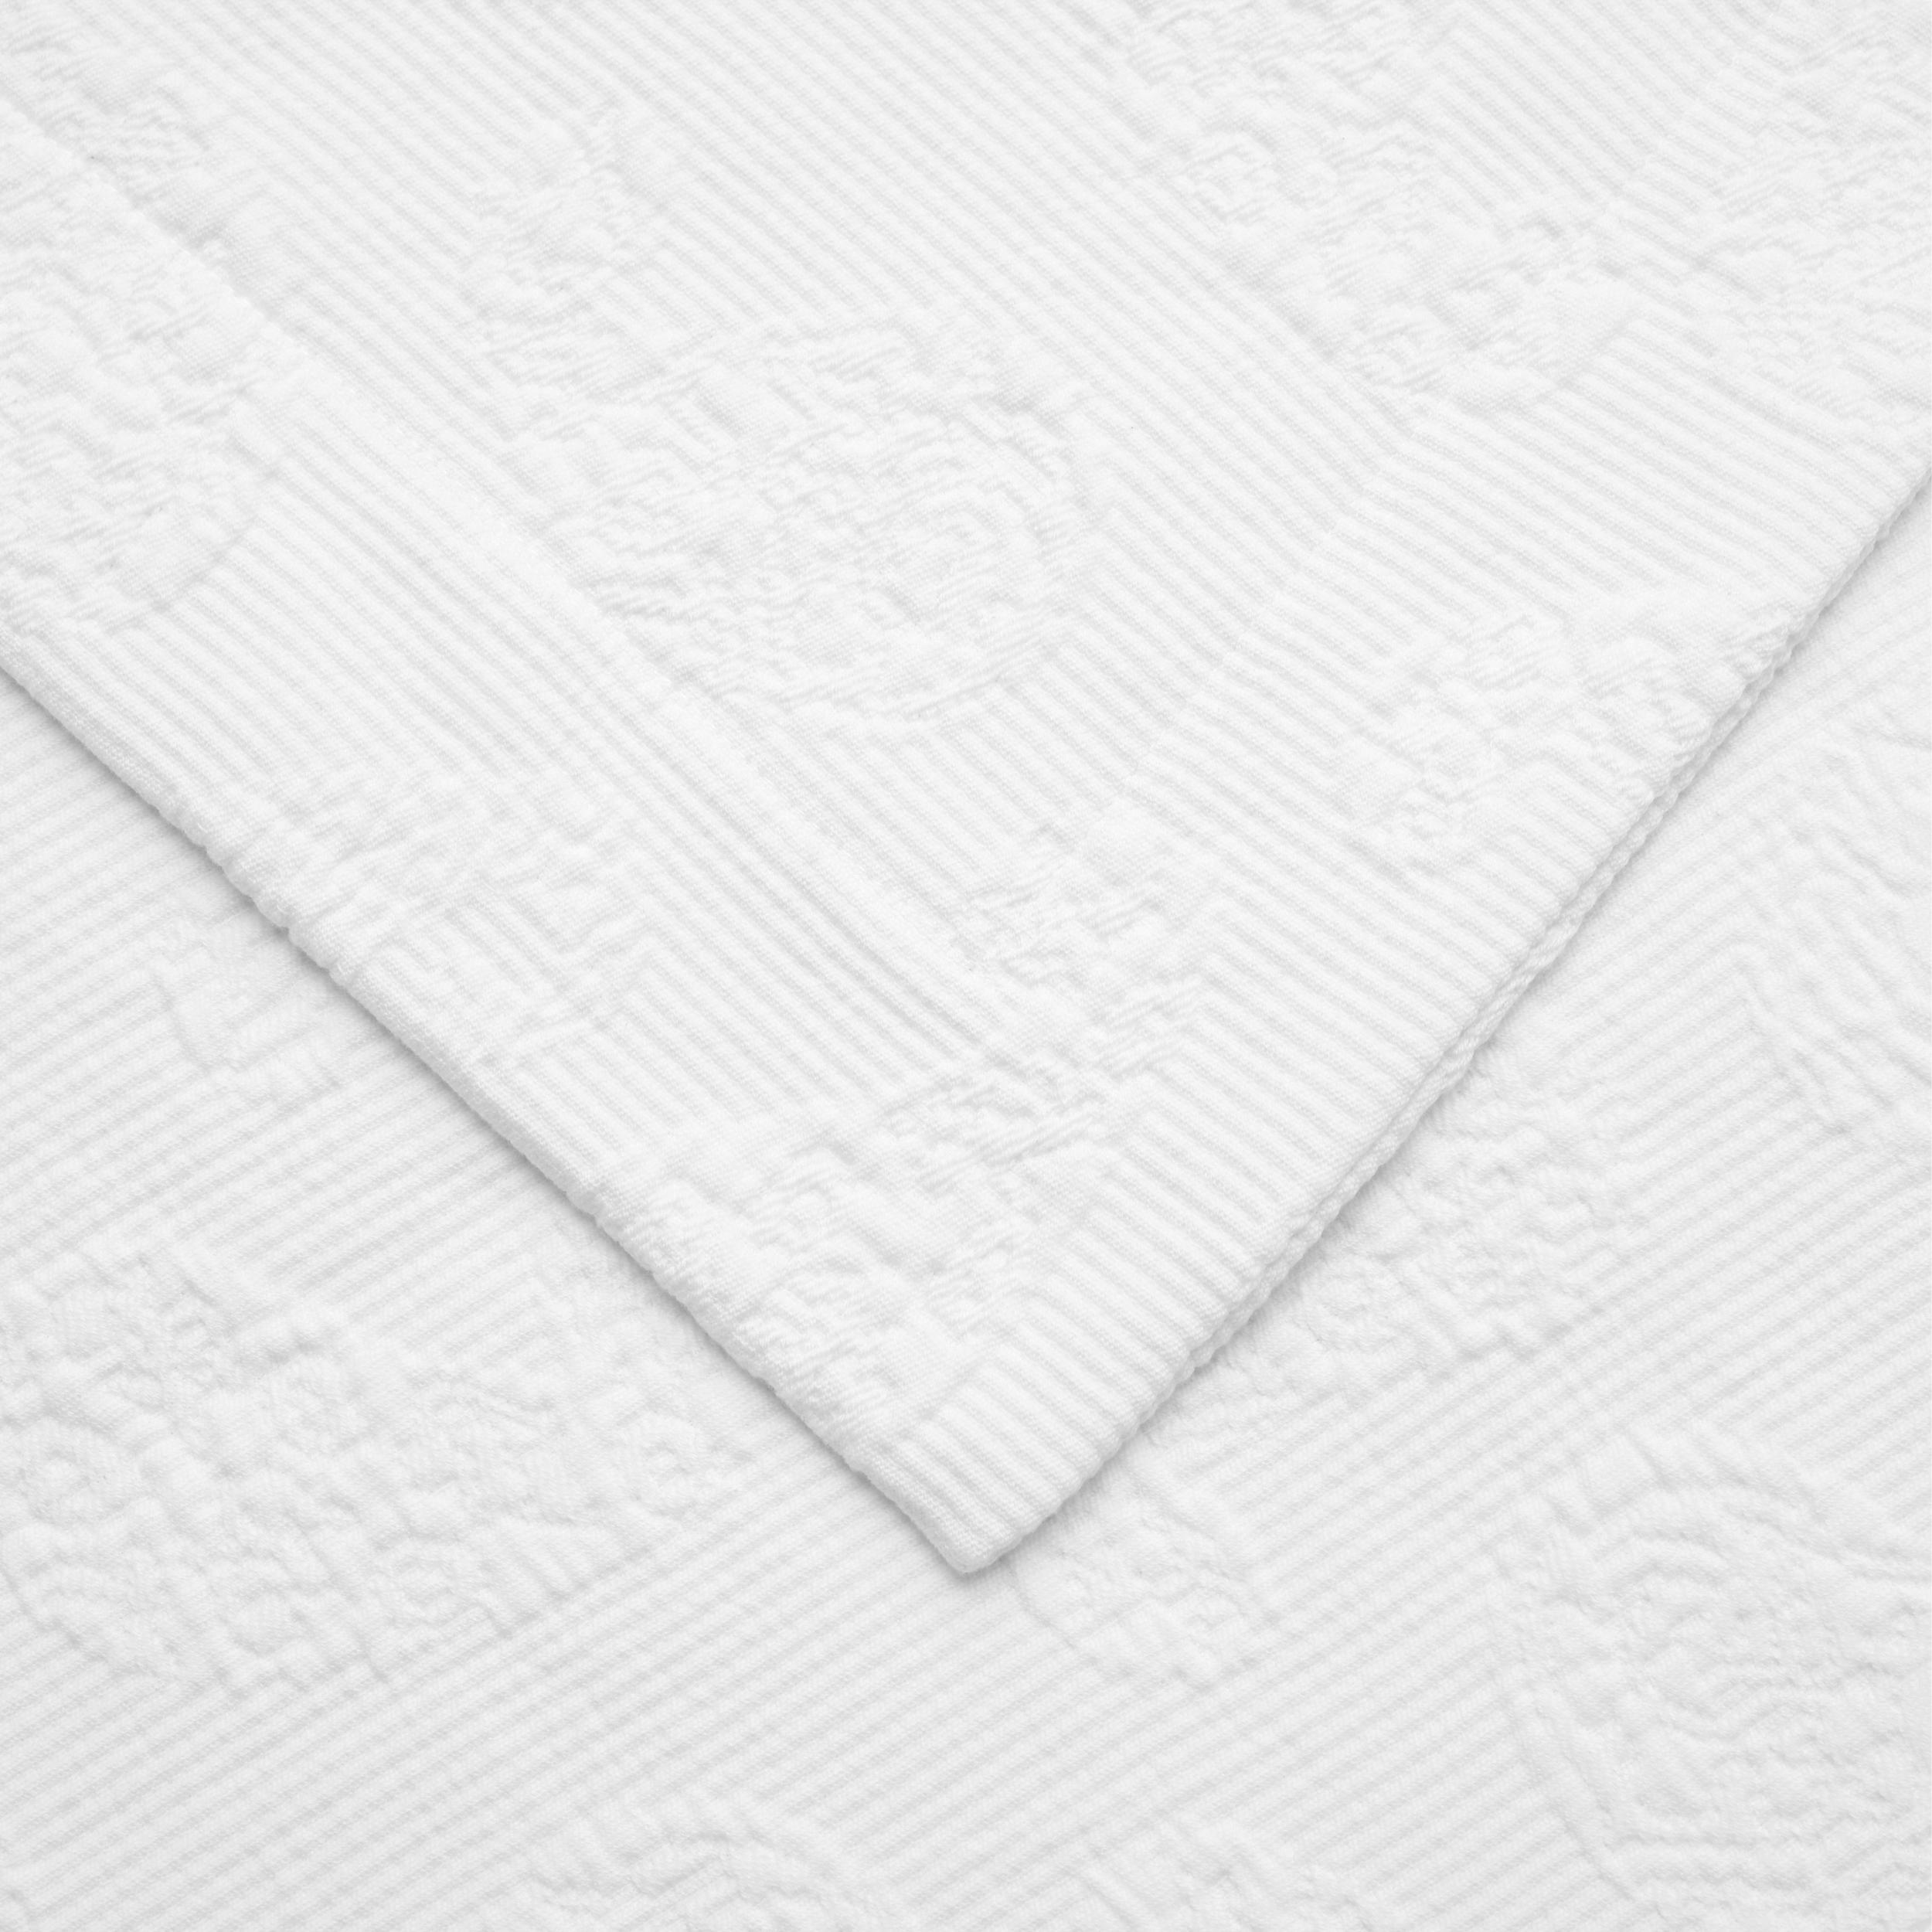 Paisley 100 Cotton Jacquard Matelasse Bedspread